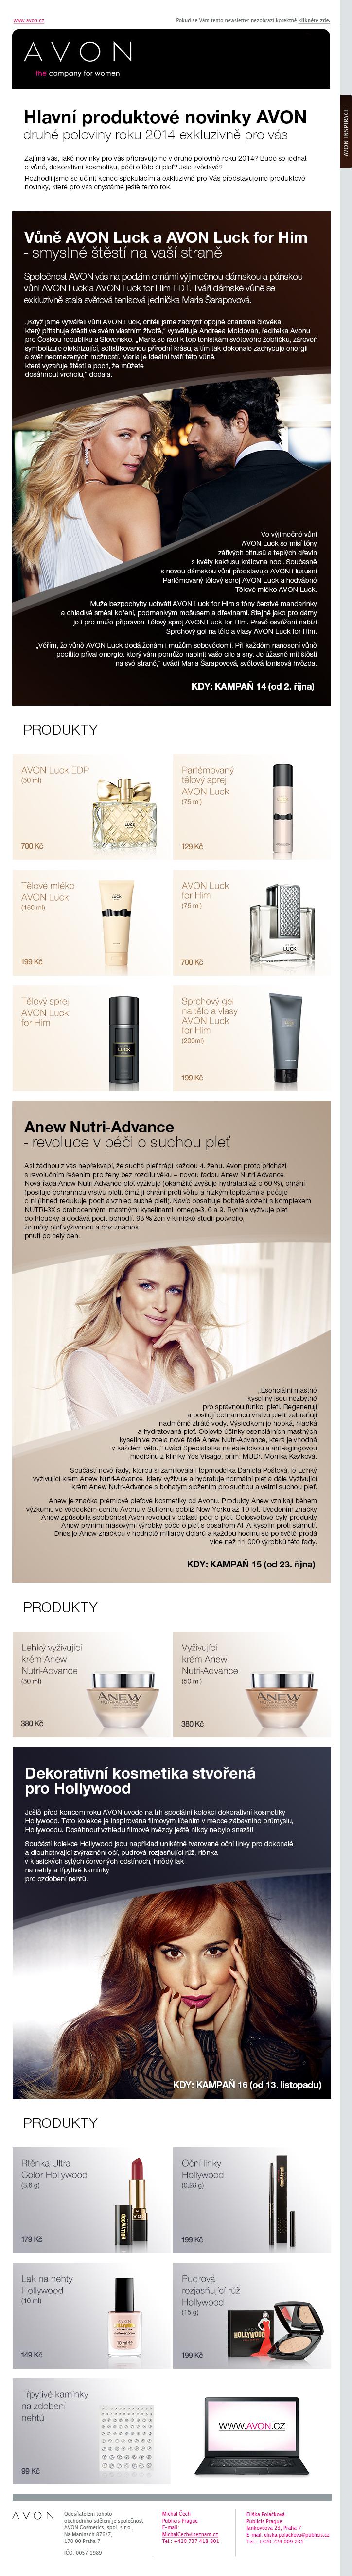 novinarsky_newsletter_zari2014